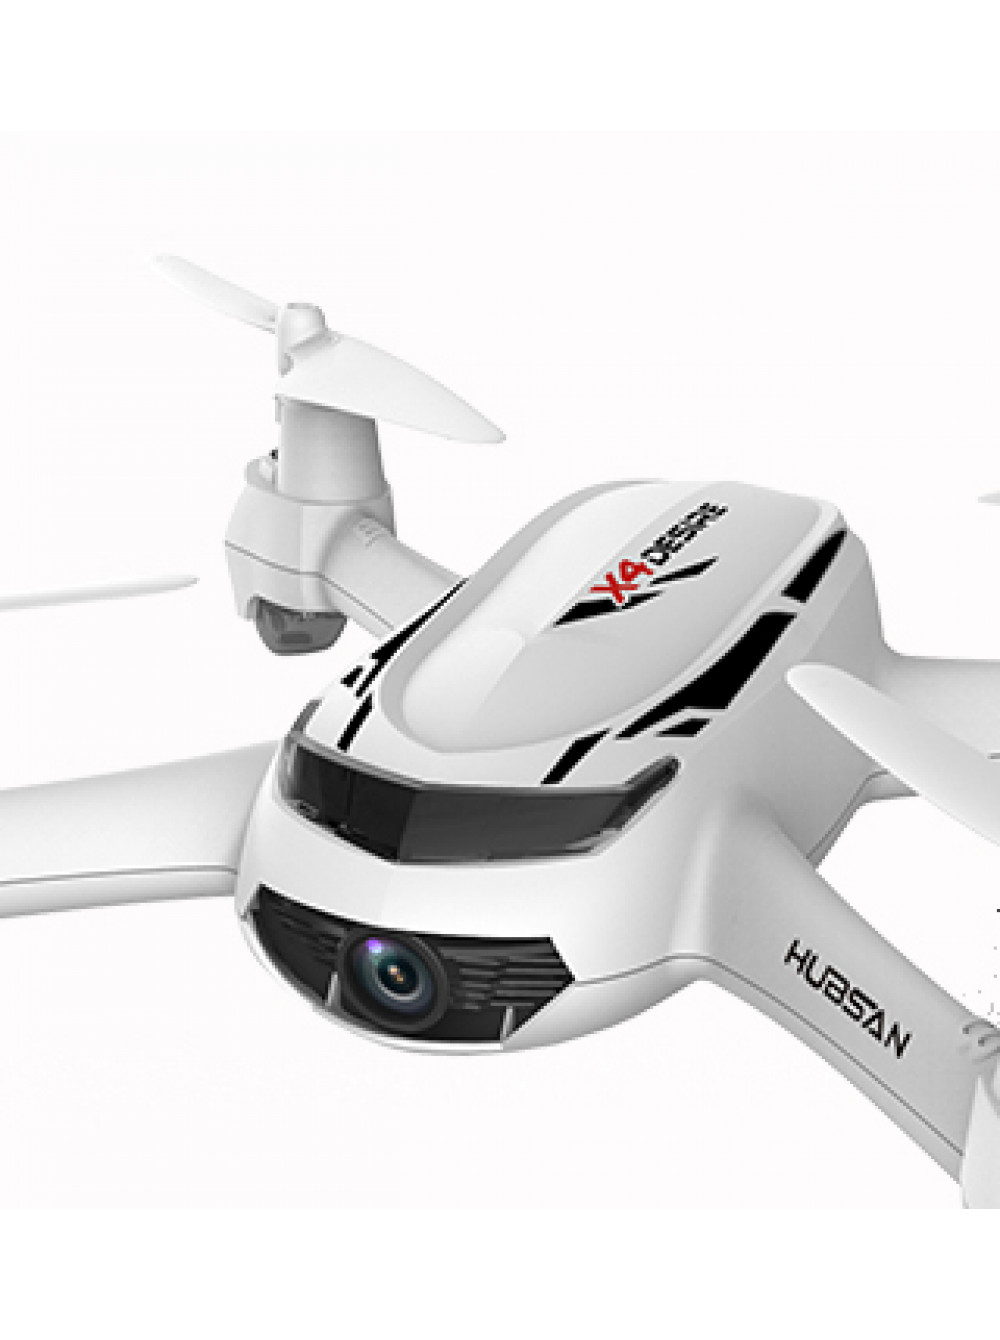 Квадрокоптер Hubsan H502S FPV c GPS